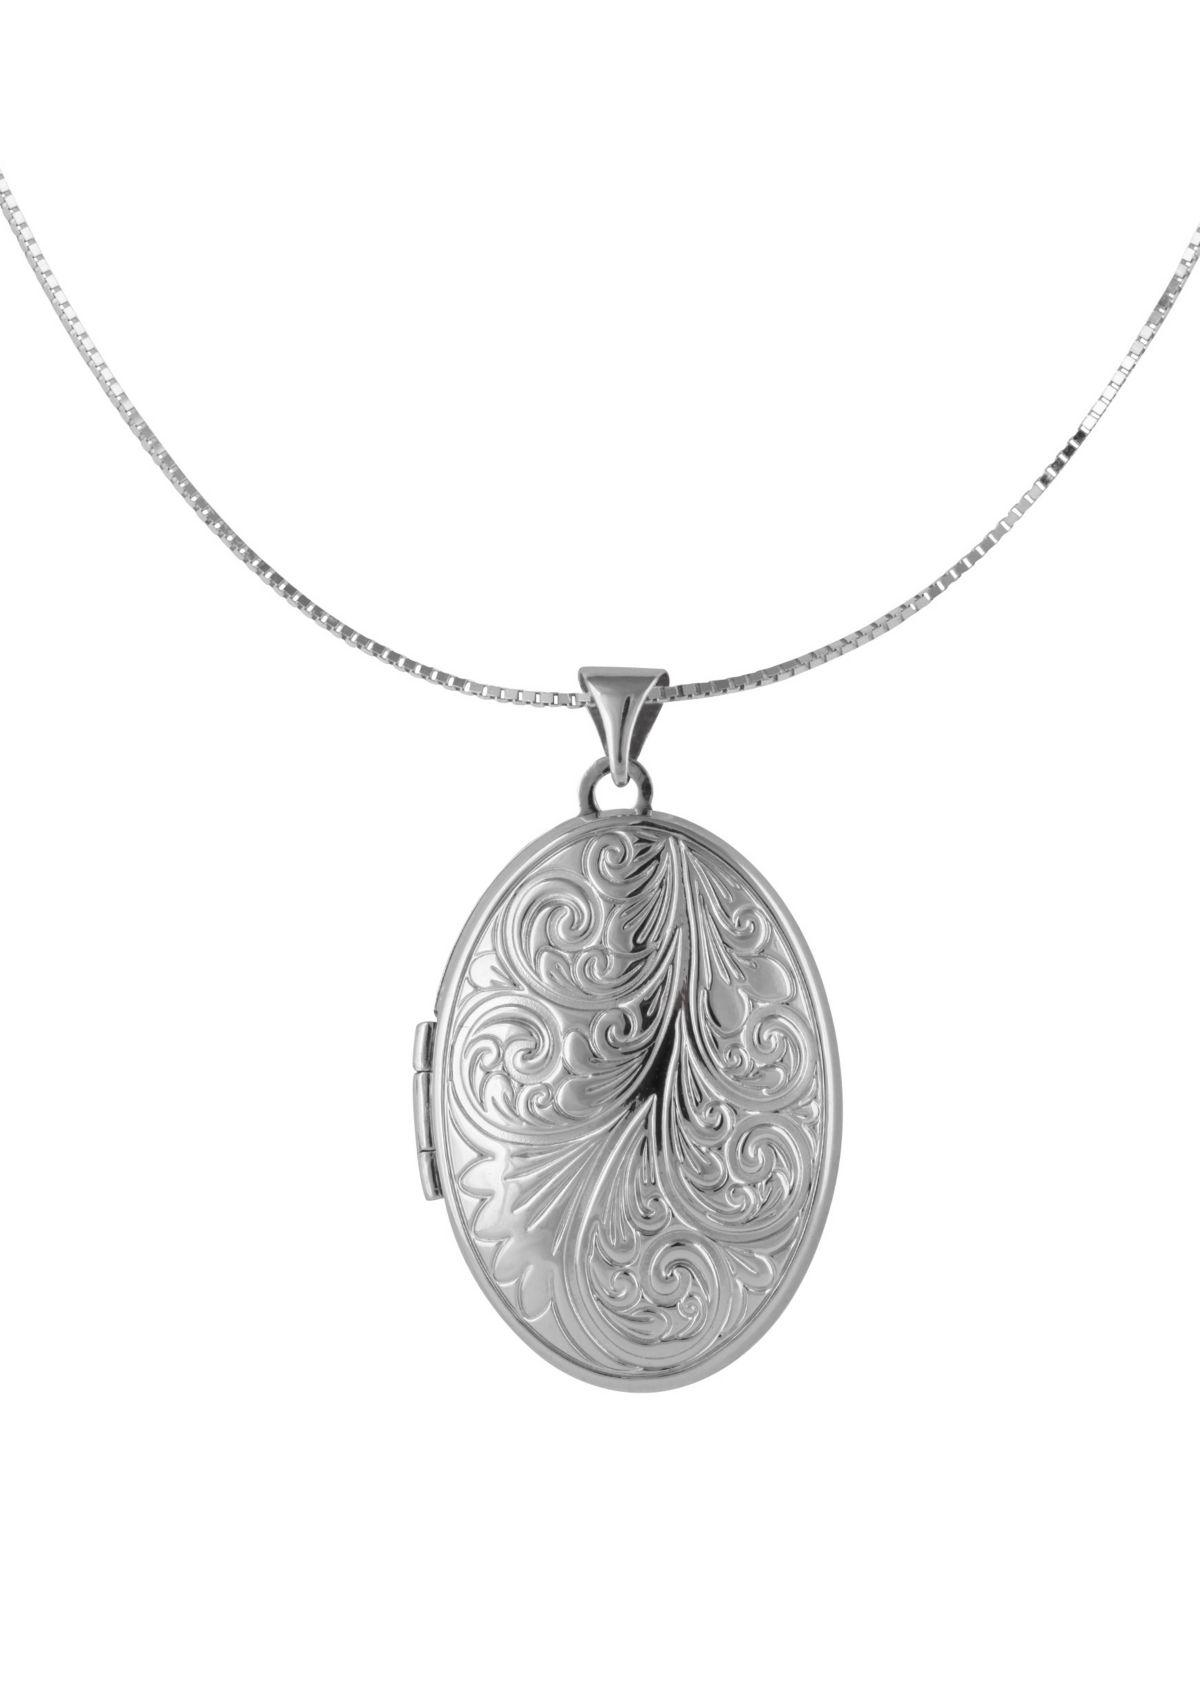 firetti Halsschmuck: Halskette »Medaillon« in V...